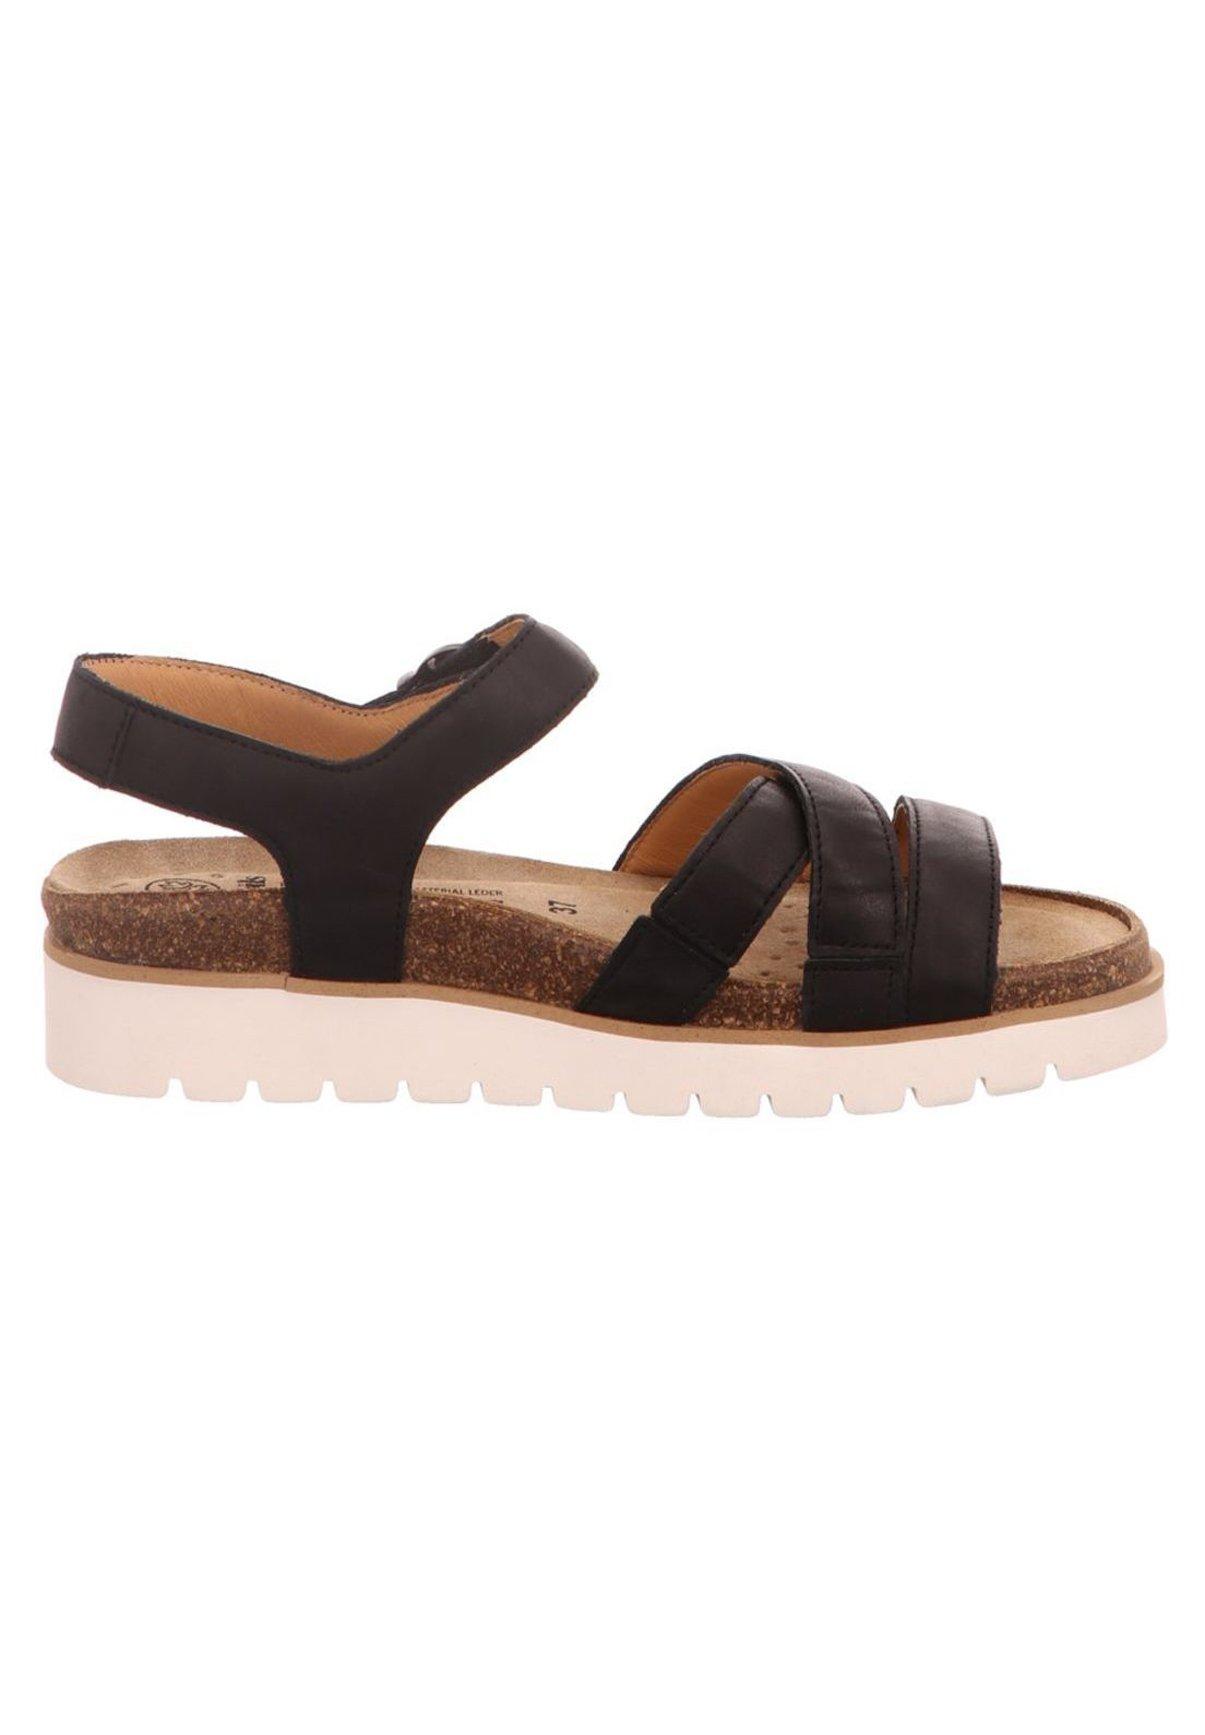 Mephisto Plateausandalette - black | Damen Schuhe 2020